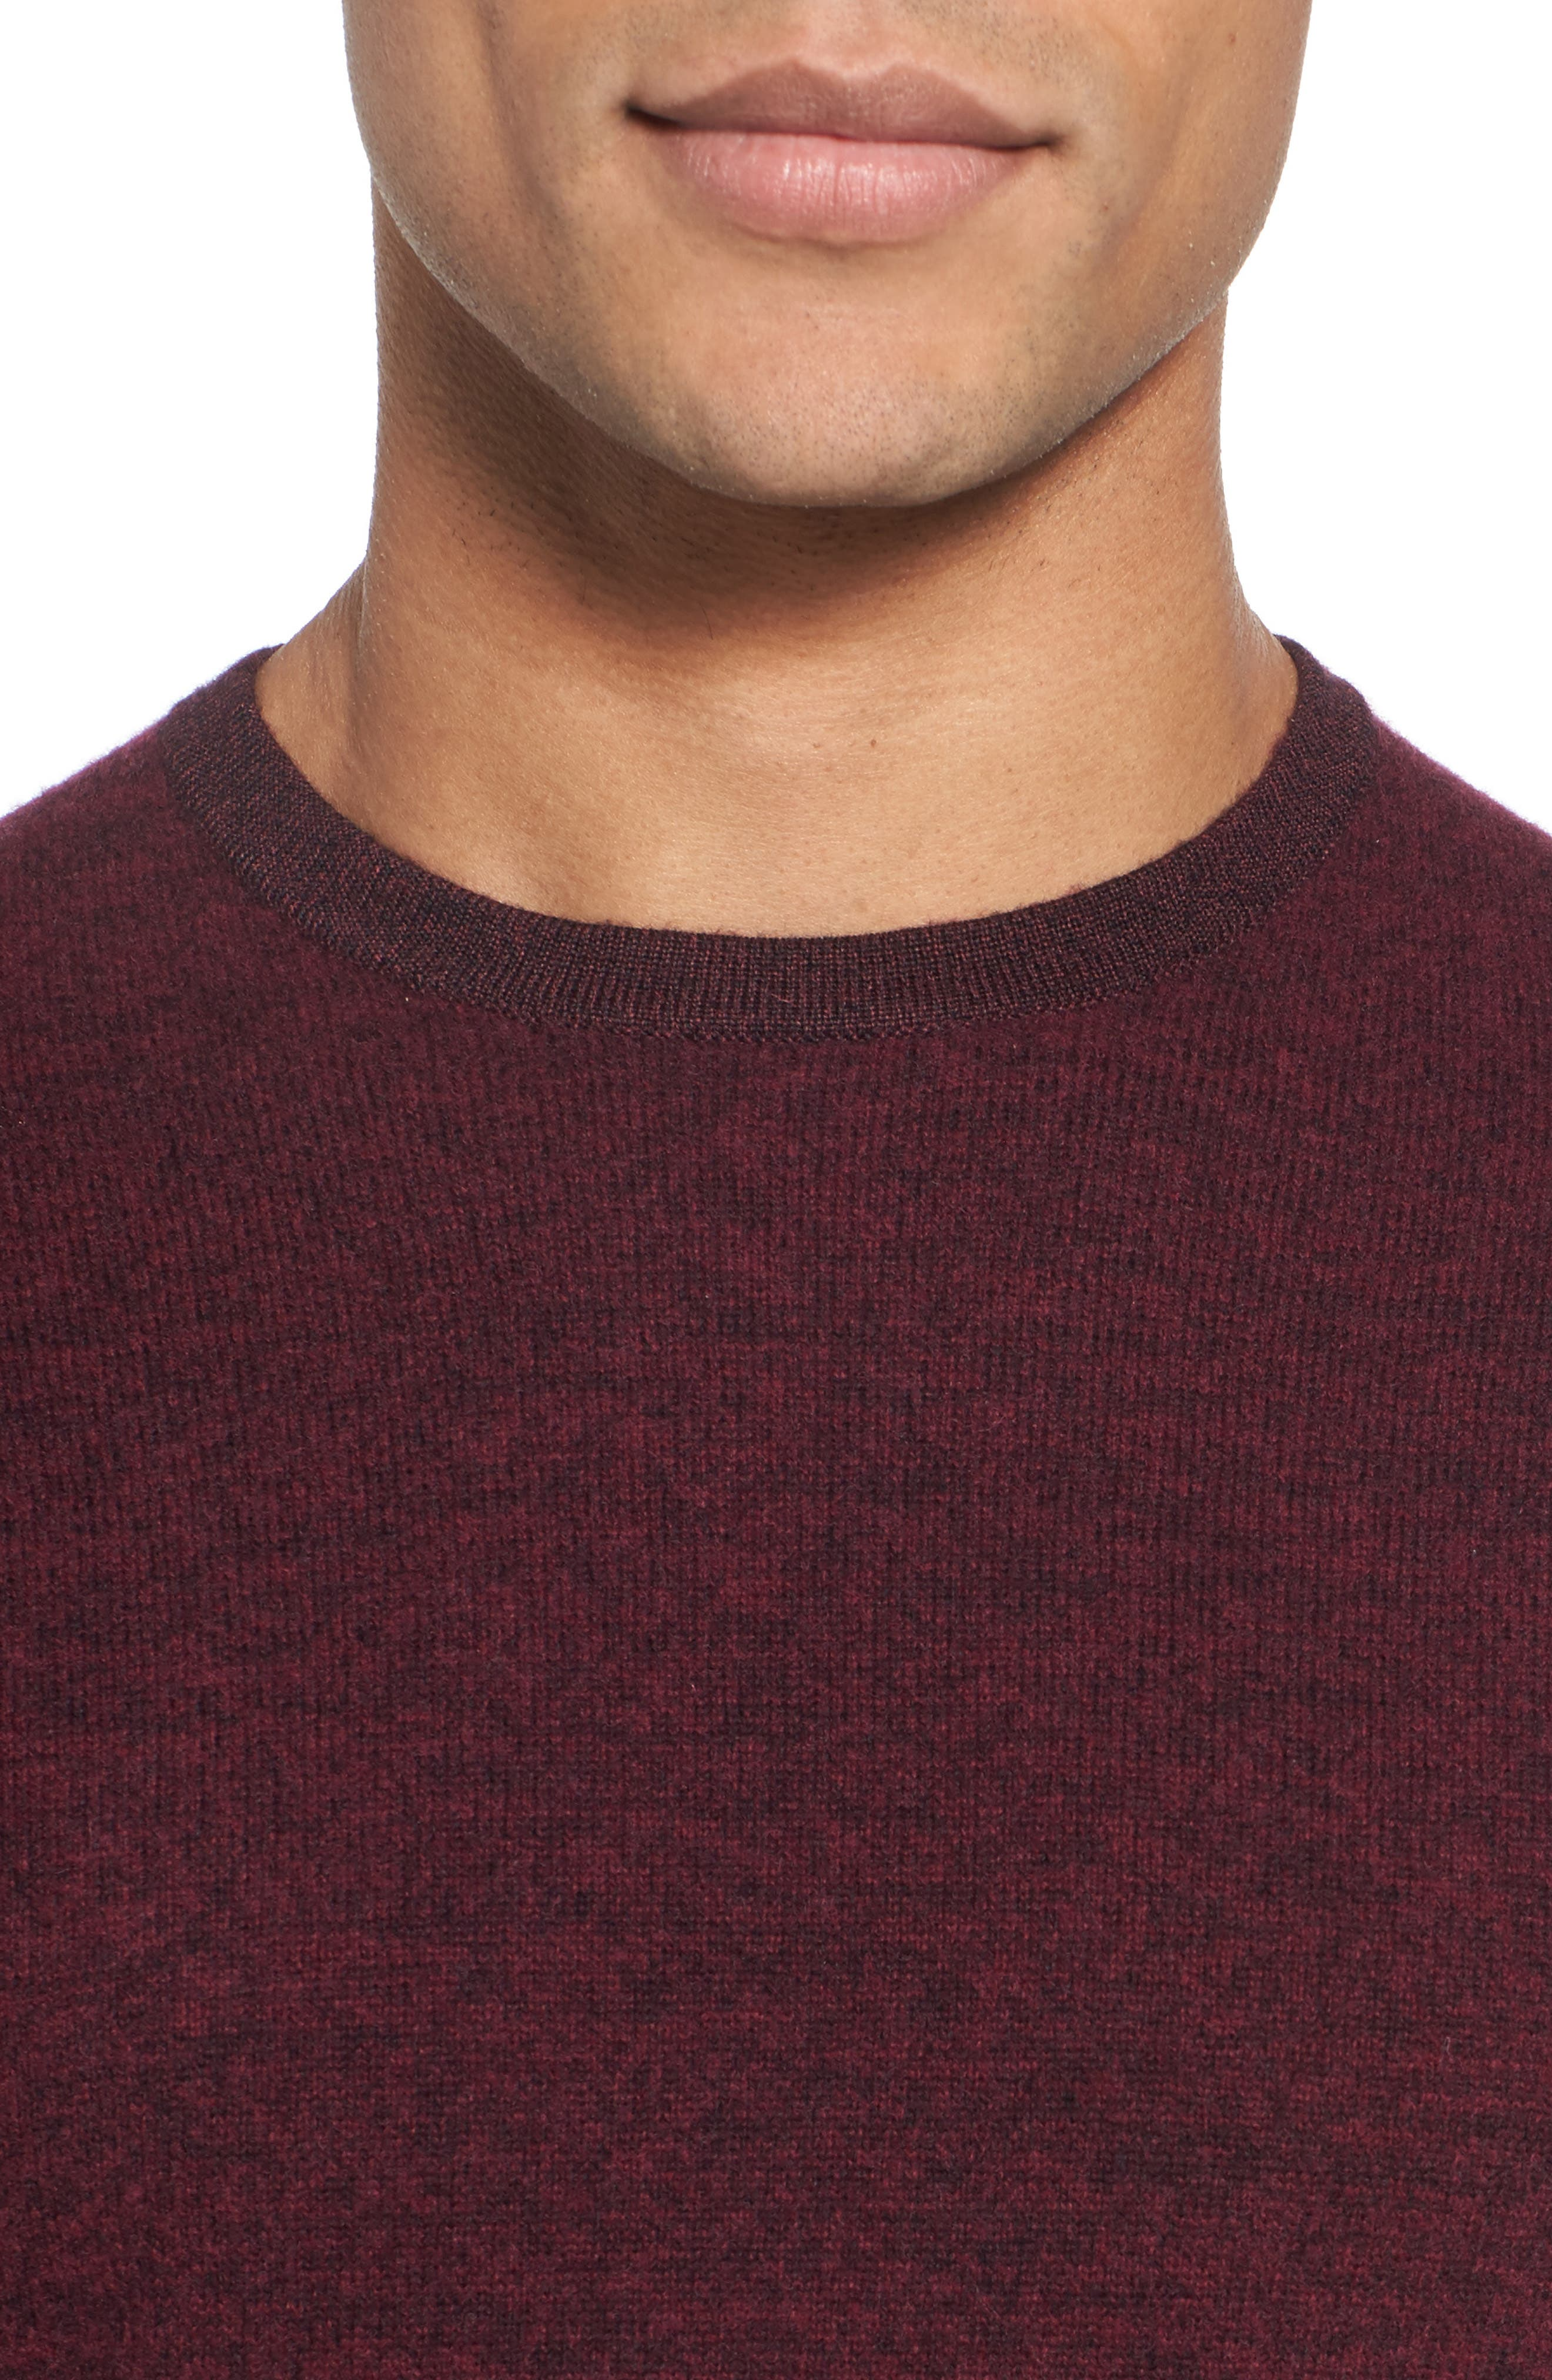 Boiled Wool Blend Crewneck Sweater,                             Alternate thumbnail 4, color,                             Burgundy Stem